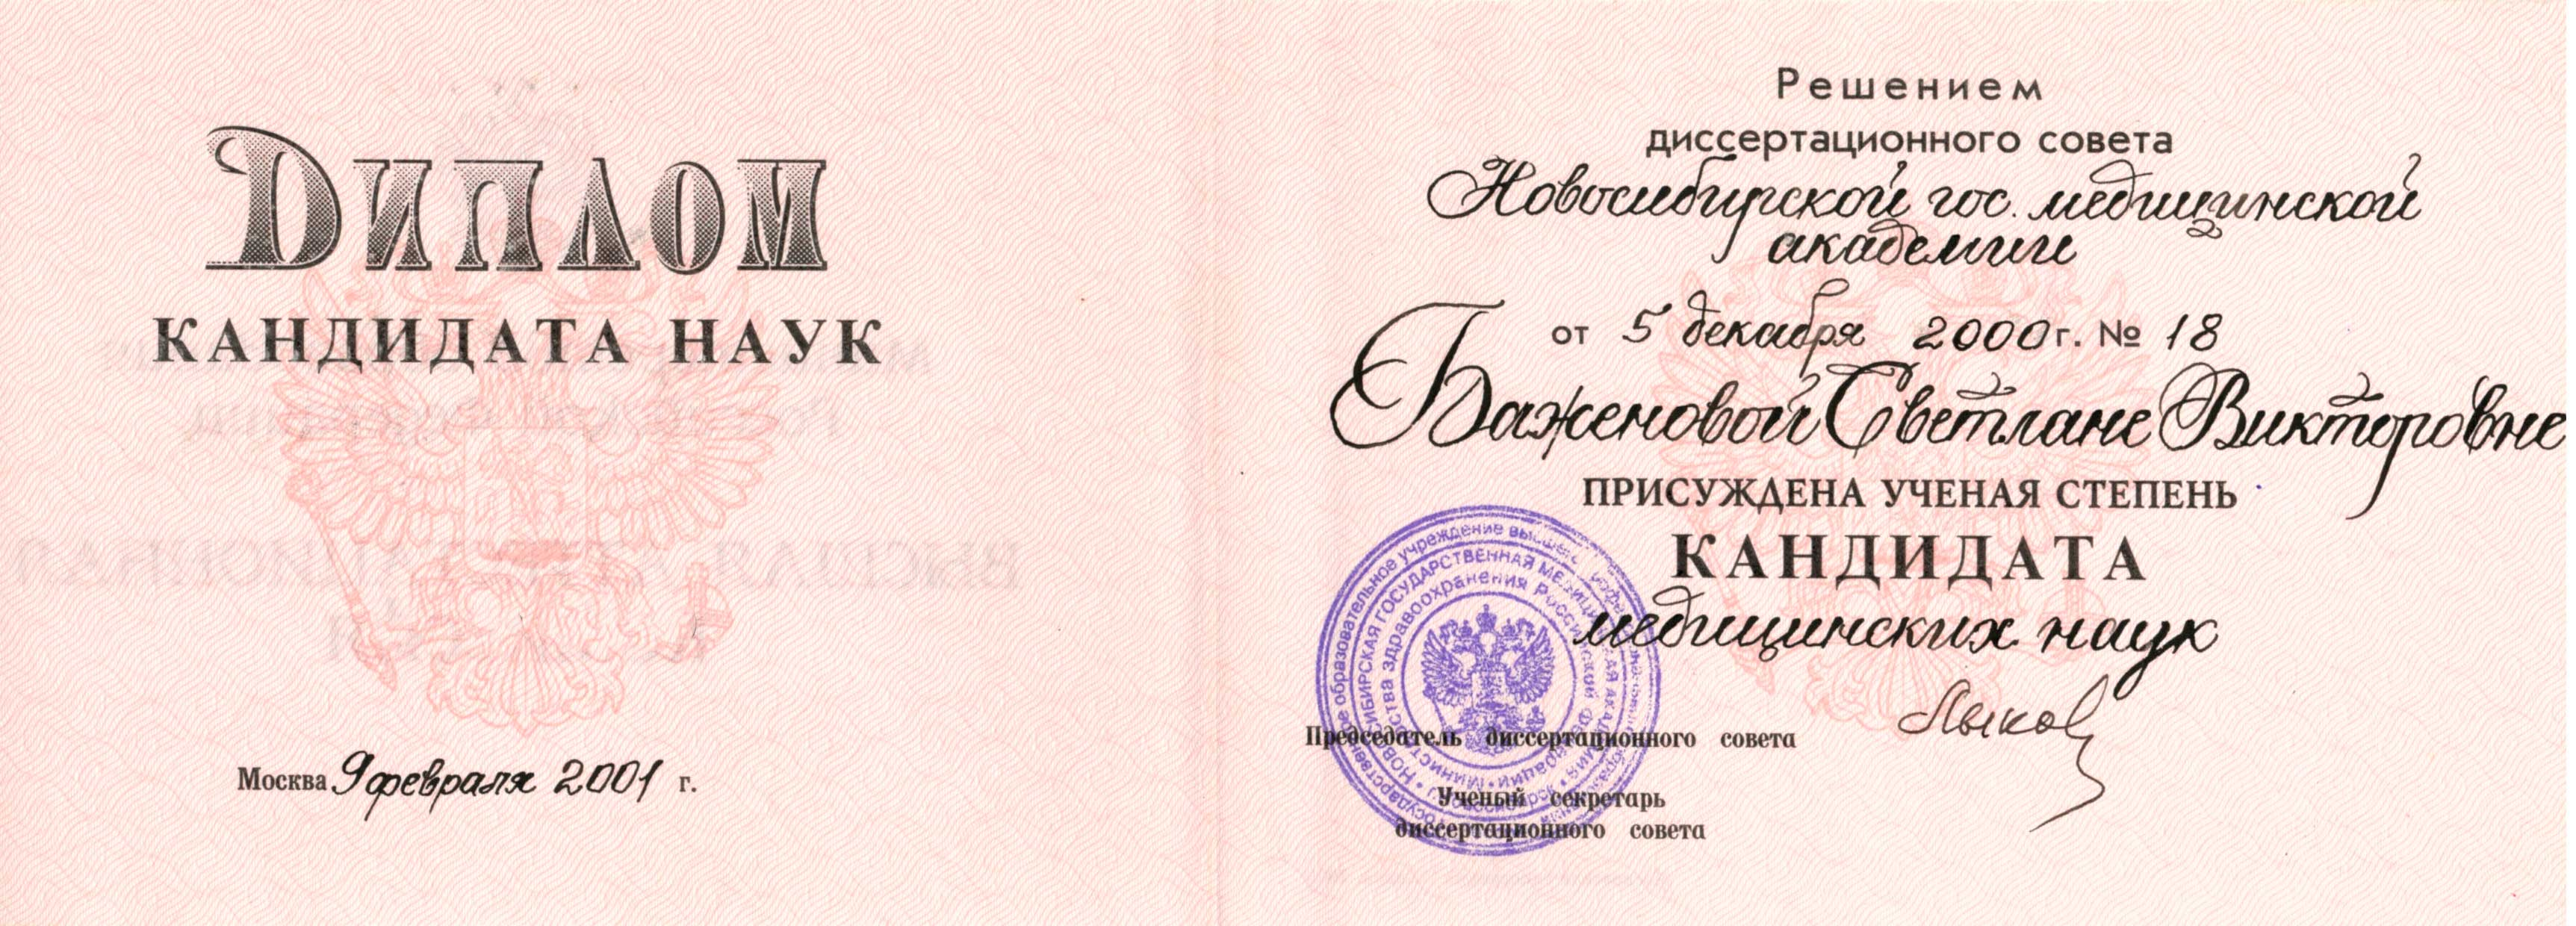 Баженова-С.В. диплом кандидата наук трихолога